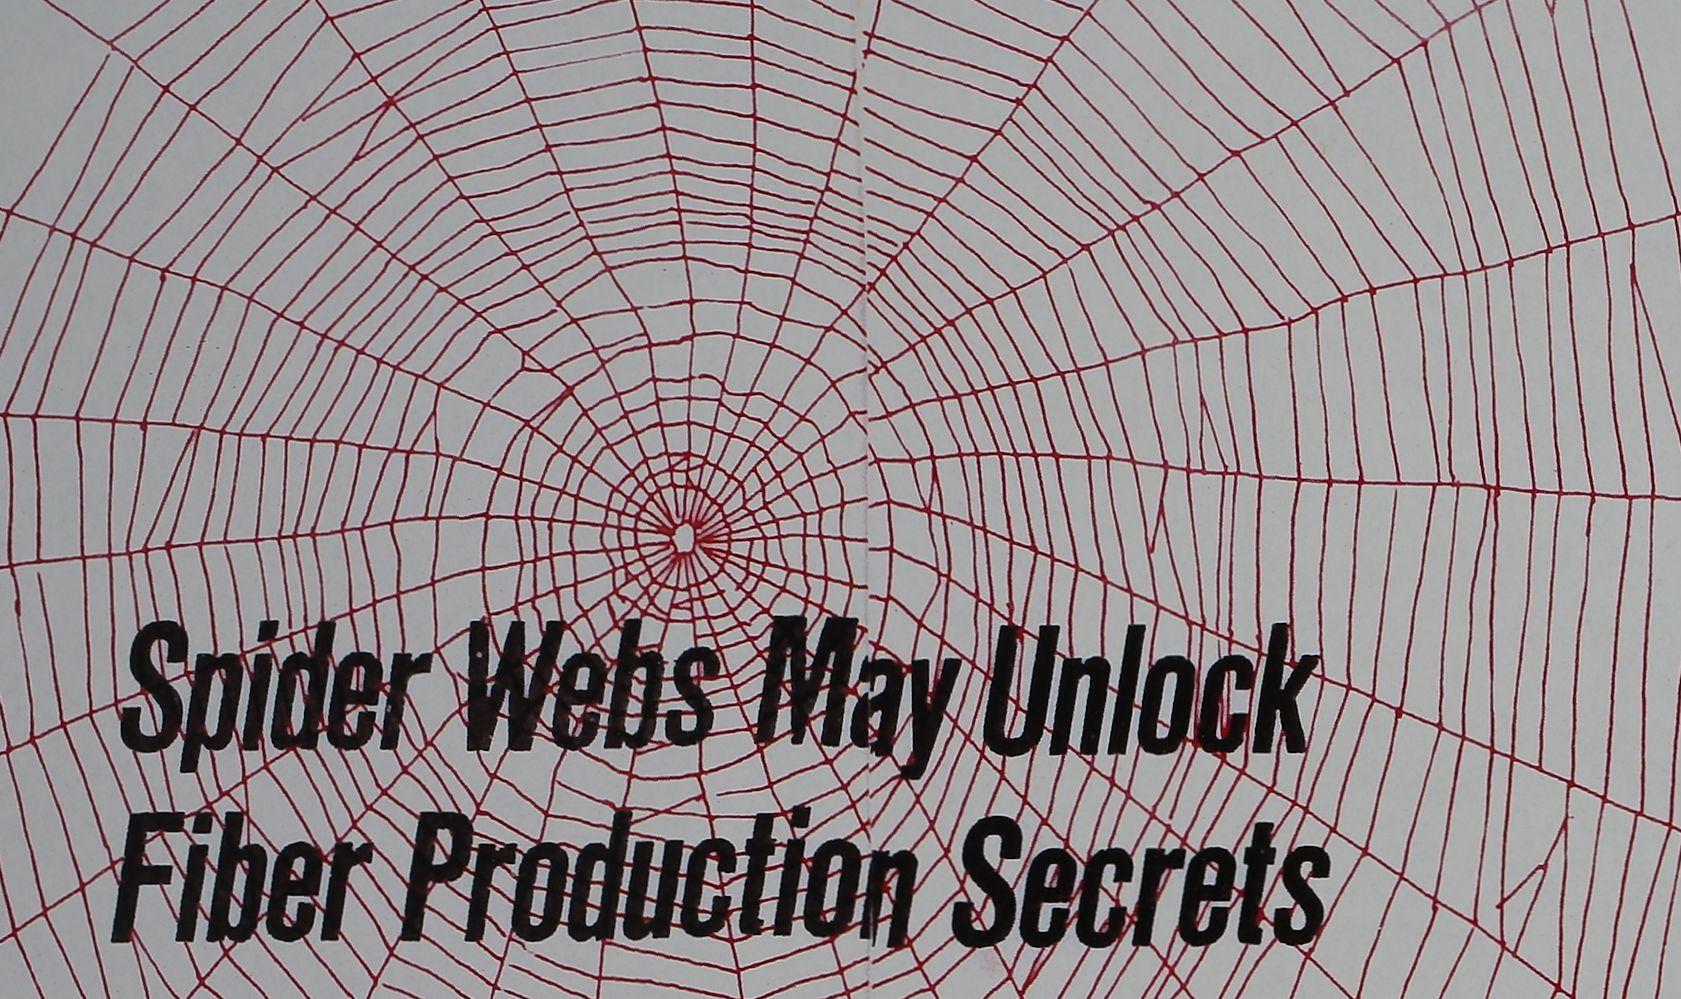 1967-Spider-Webs-May-Unlock-1